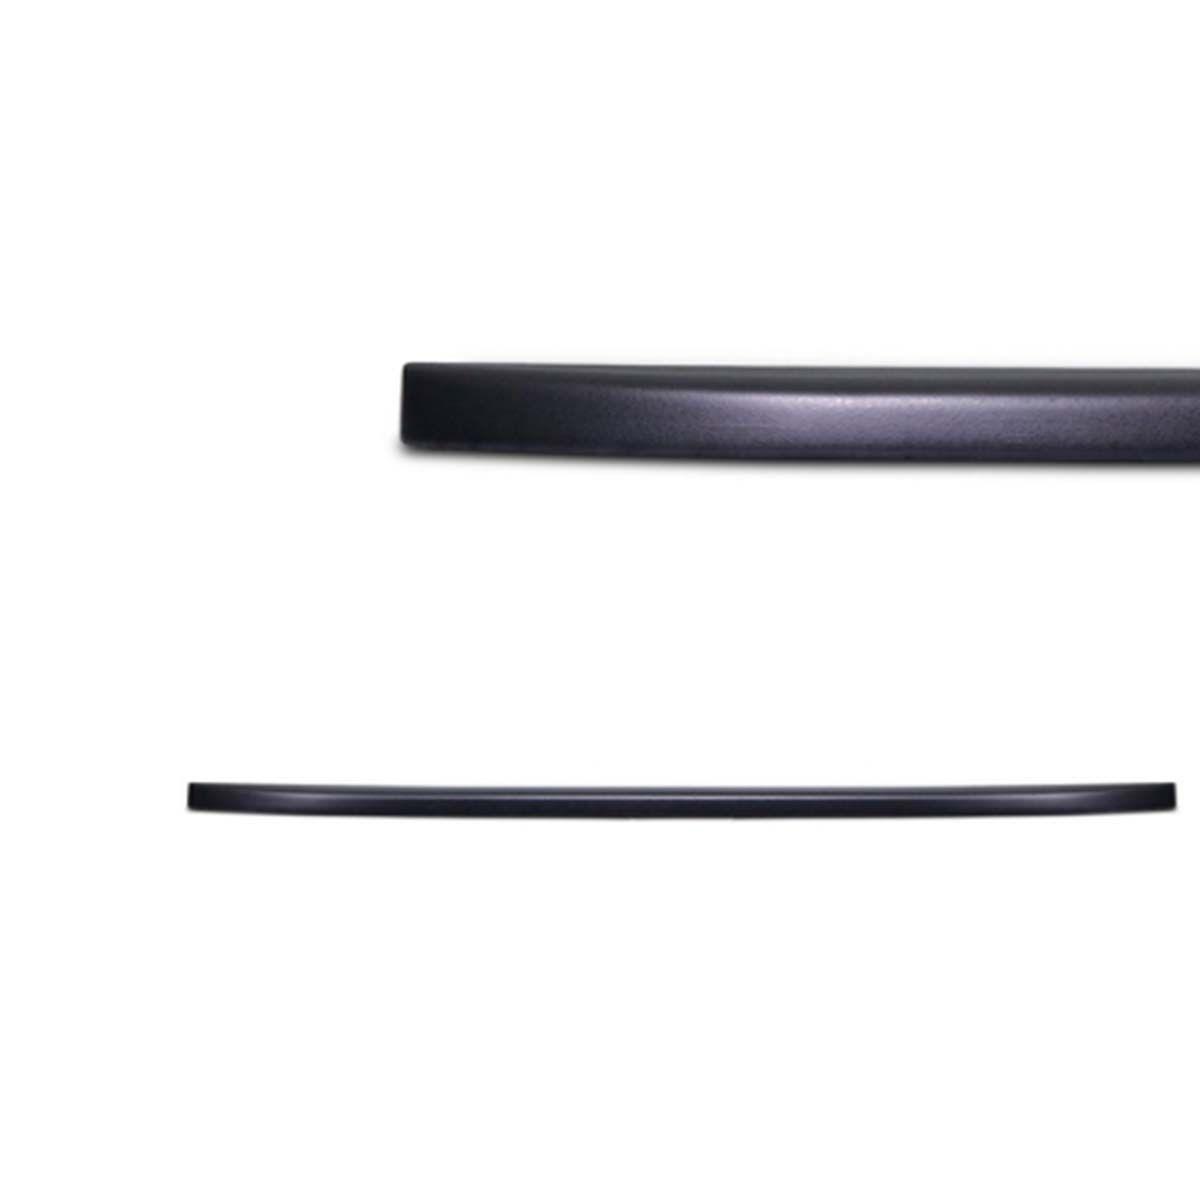 Rack De Teto Slim Longarina Universal Decorativa 135CM (PRETO)